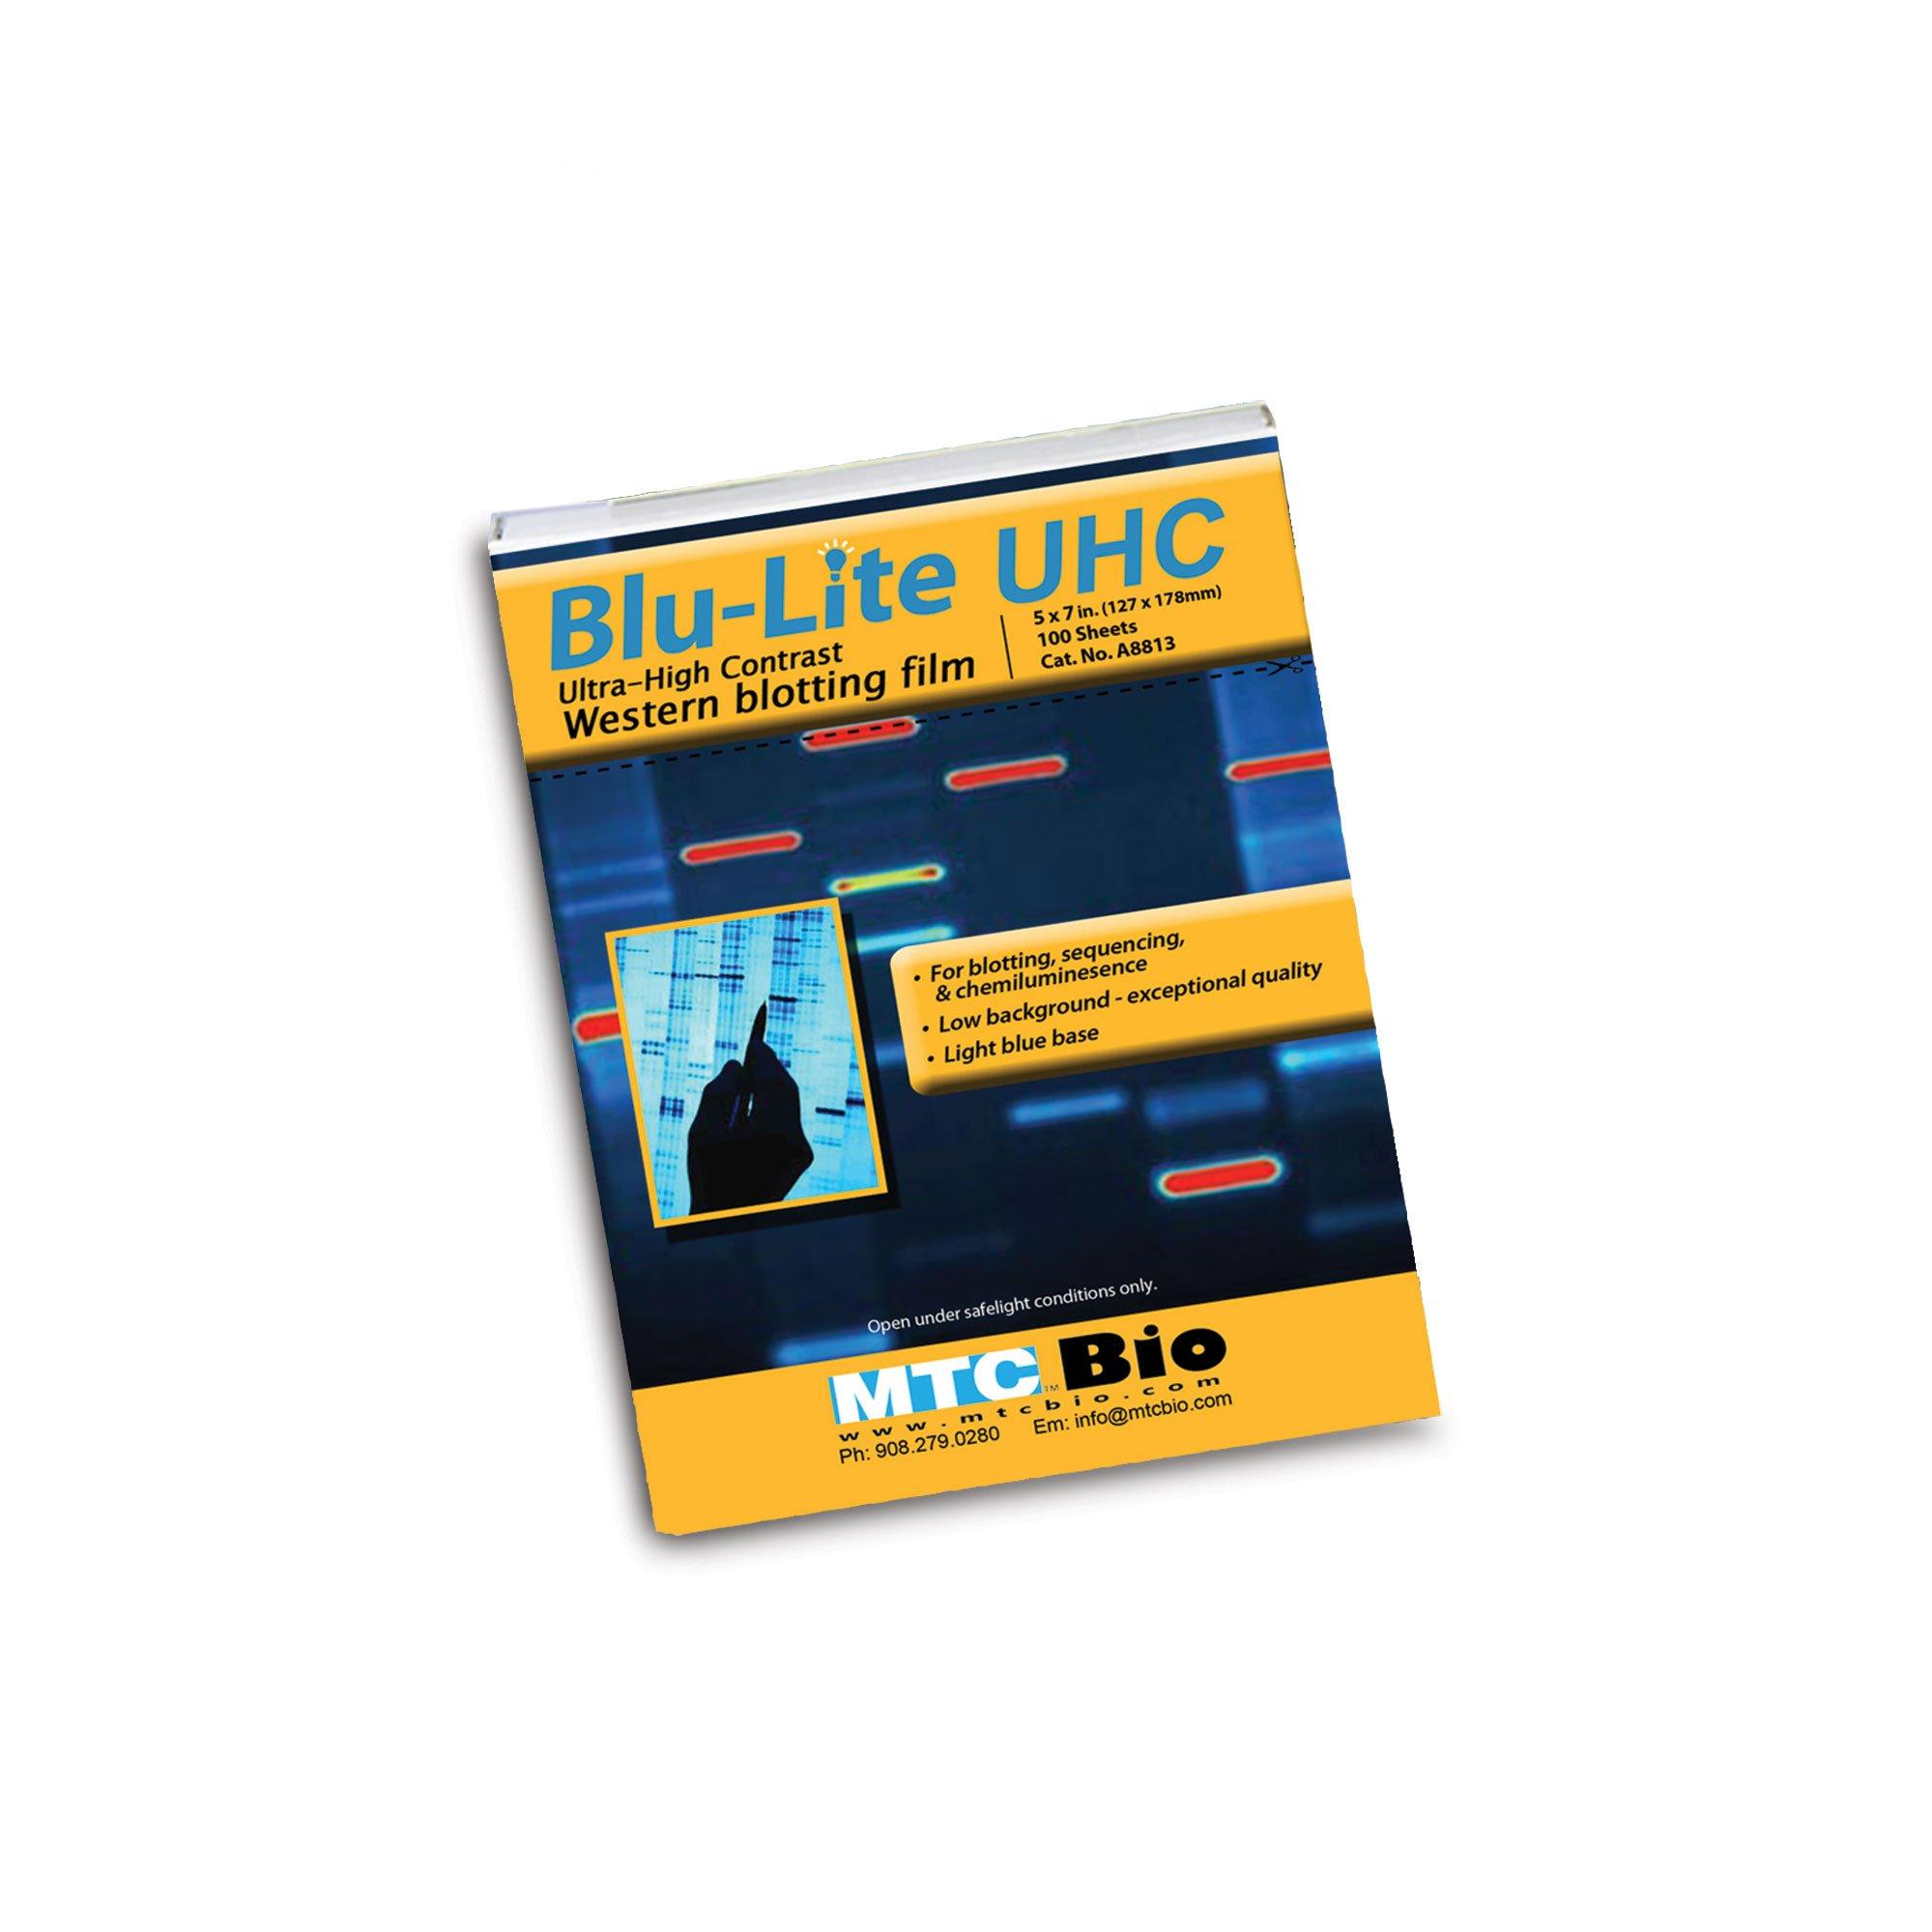 BluLite UHC Autoradiography Film, 5'' x 7''